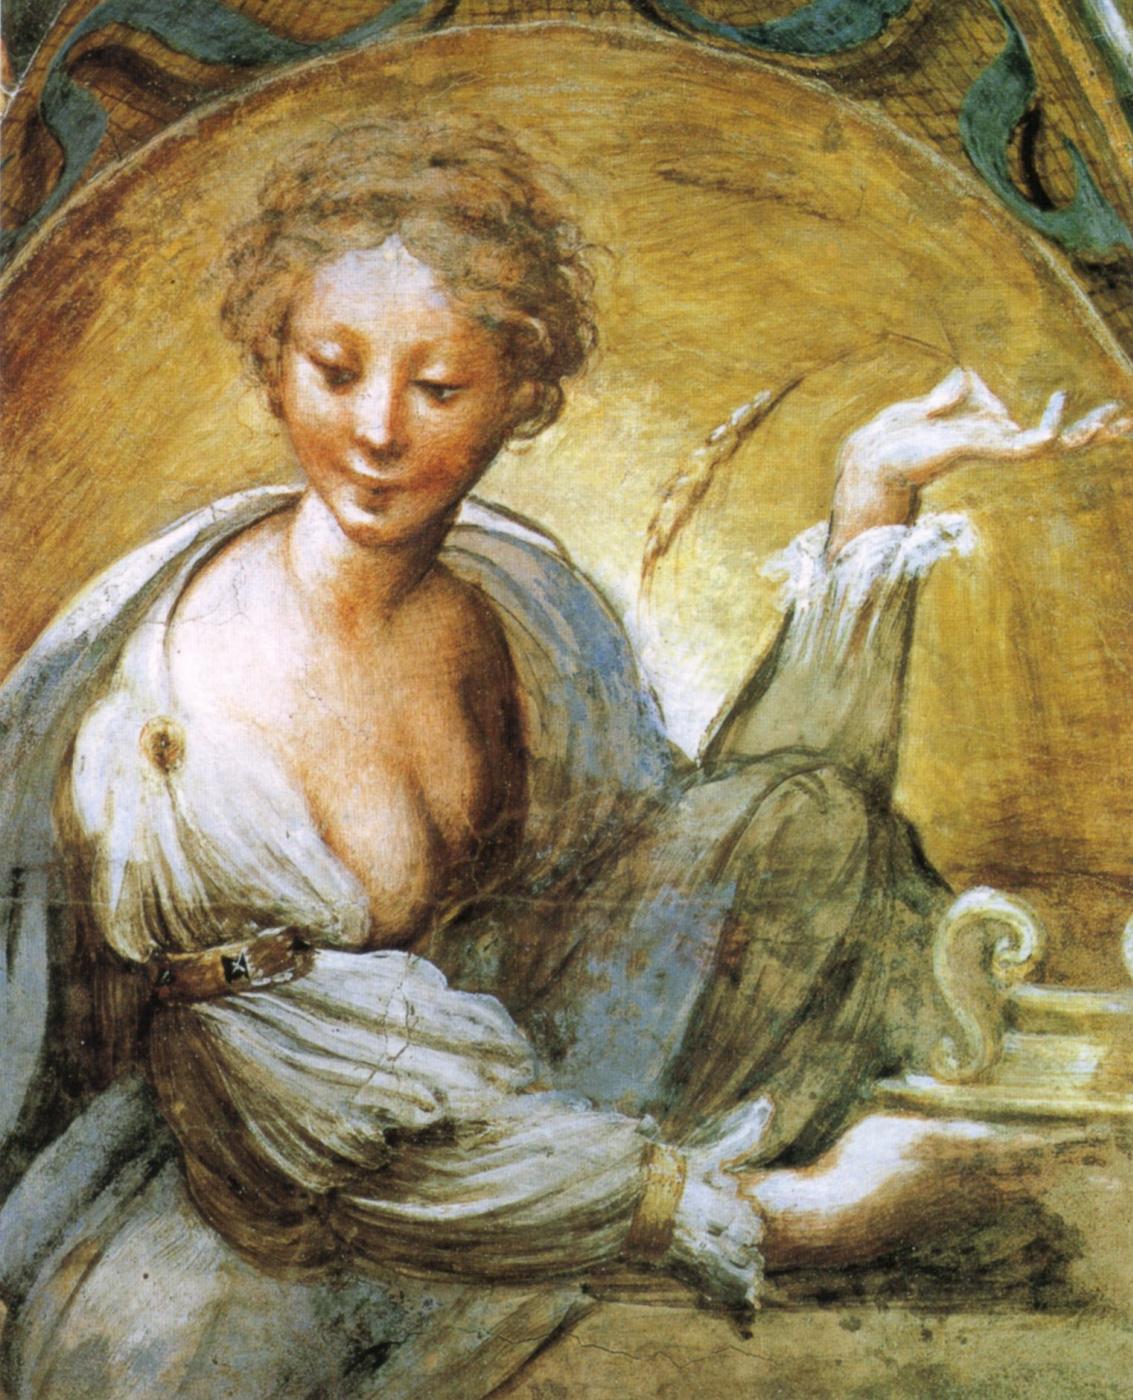 Francesco Parmigianino. The story of Diana and Actaeon. Fragment